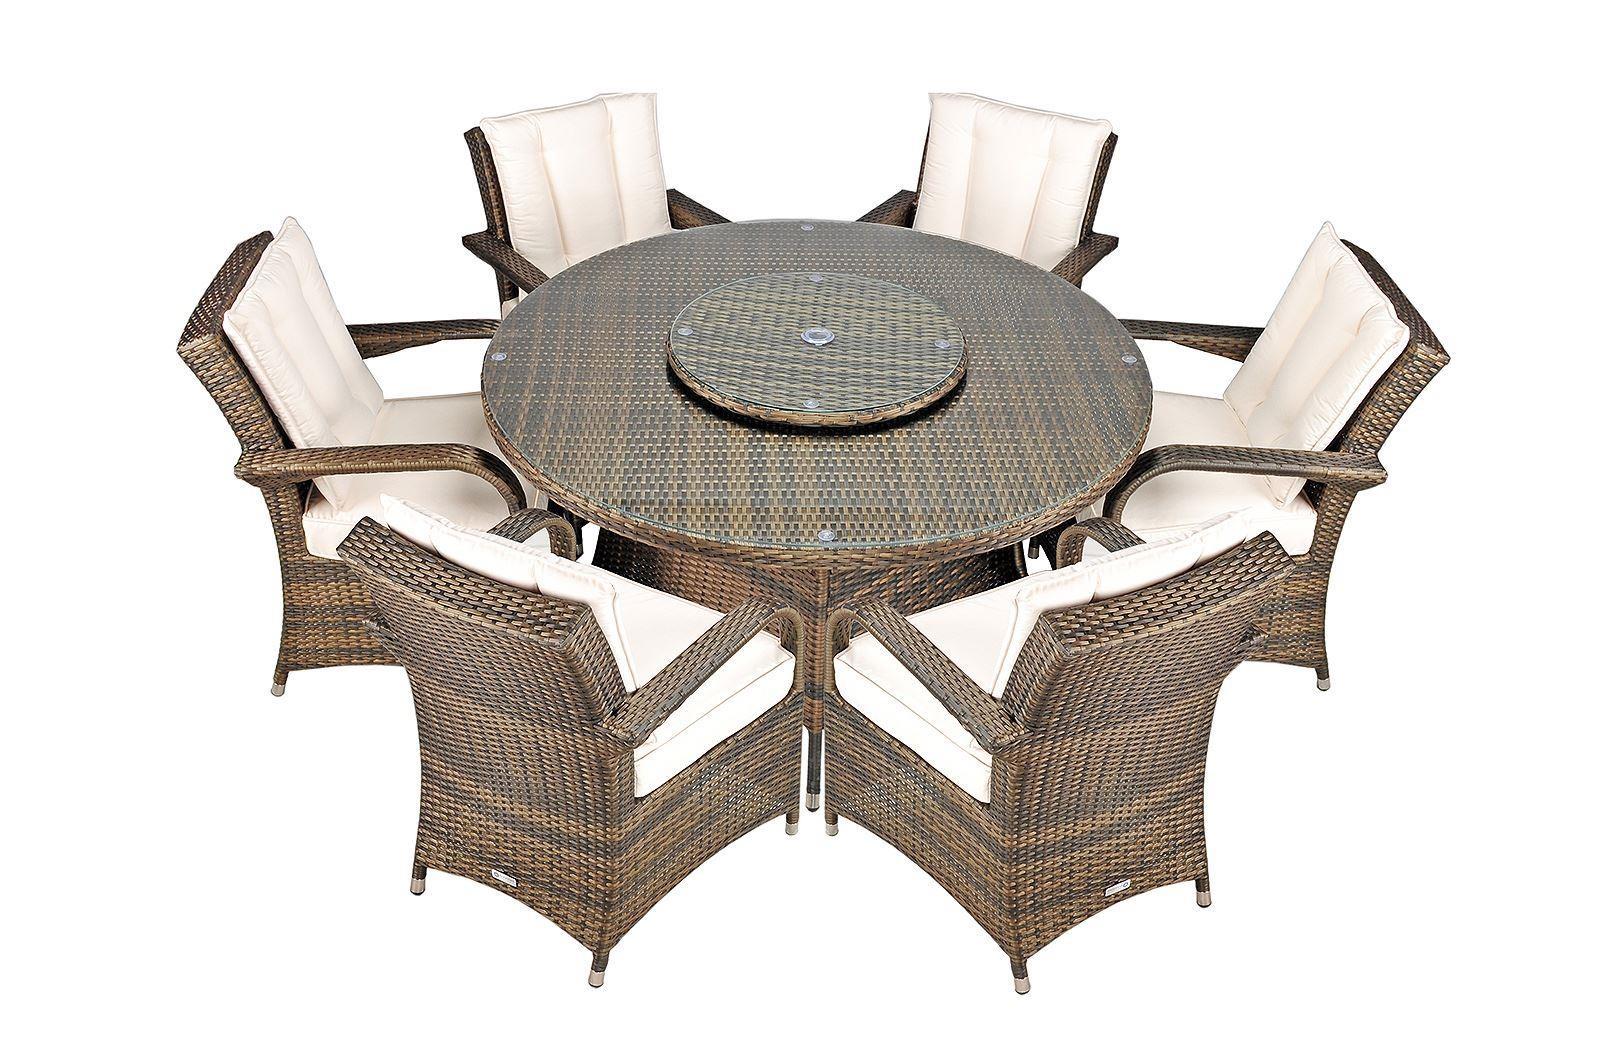 Arizona Rattan Garden Furniture 6 Seat Dining Set With